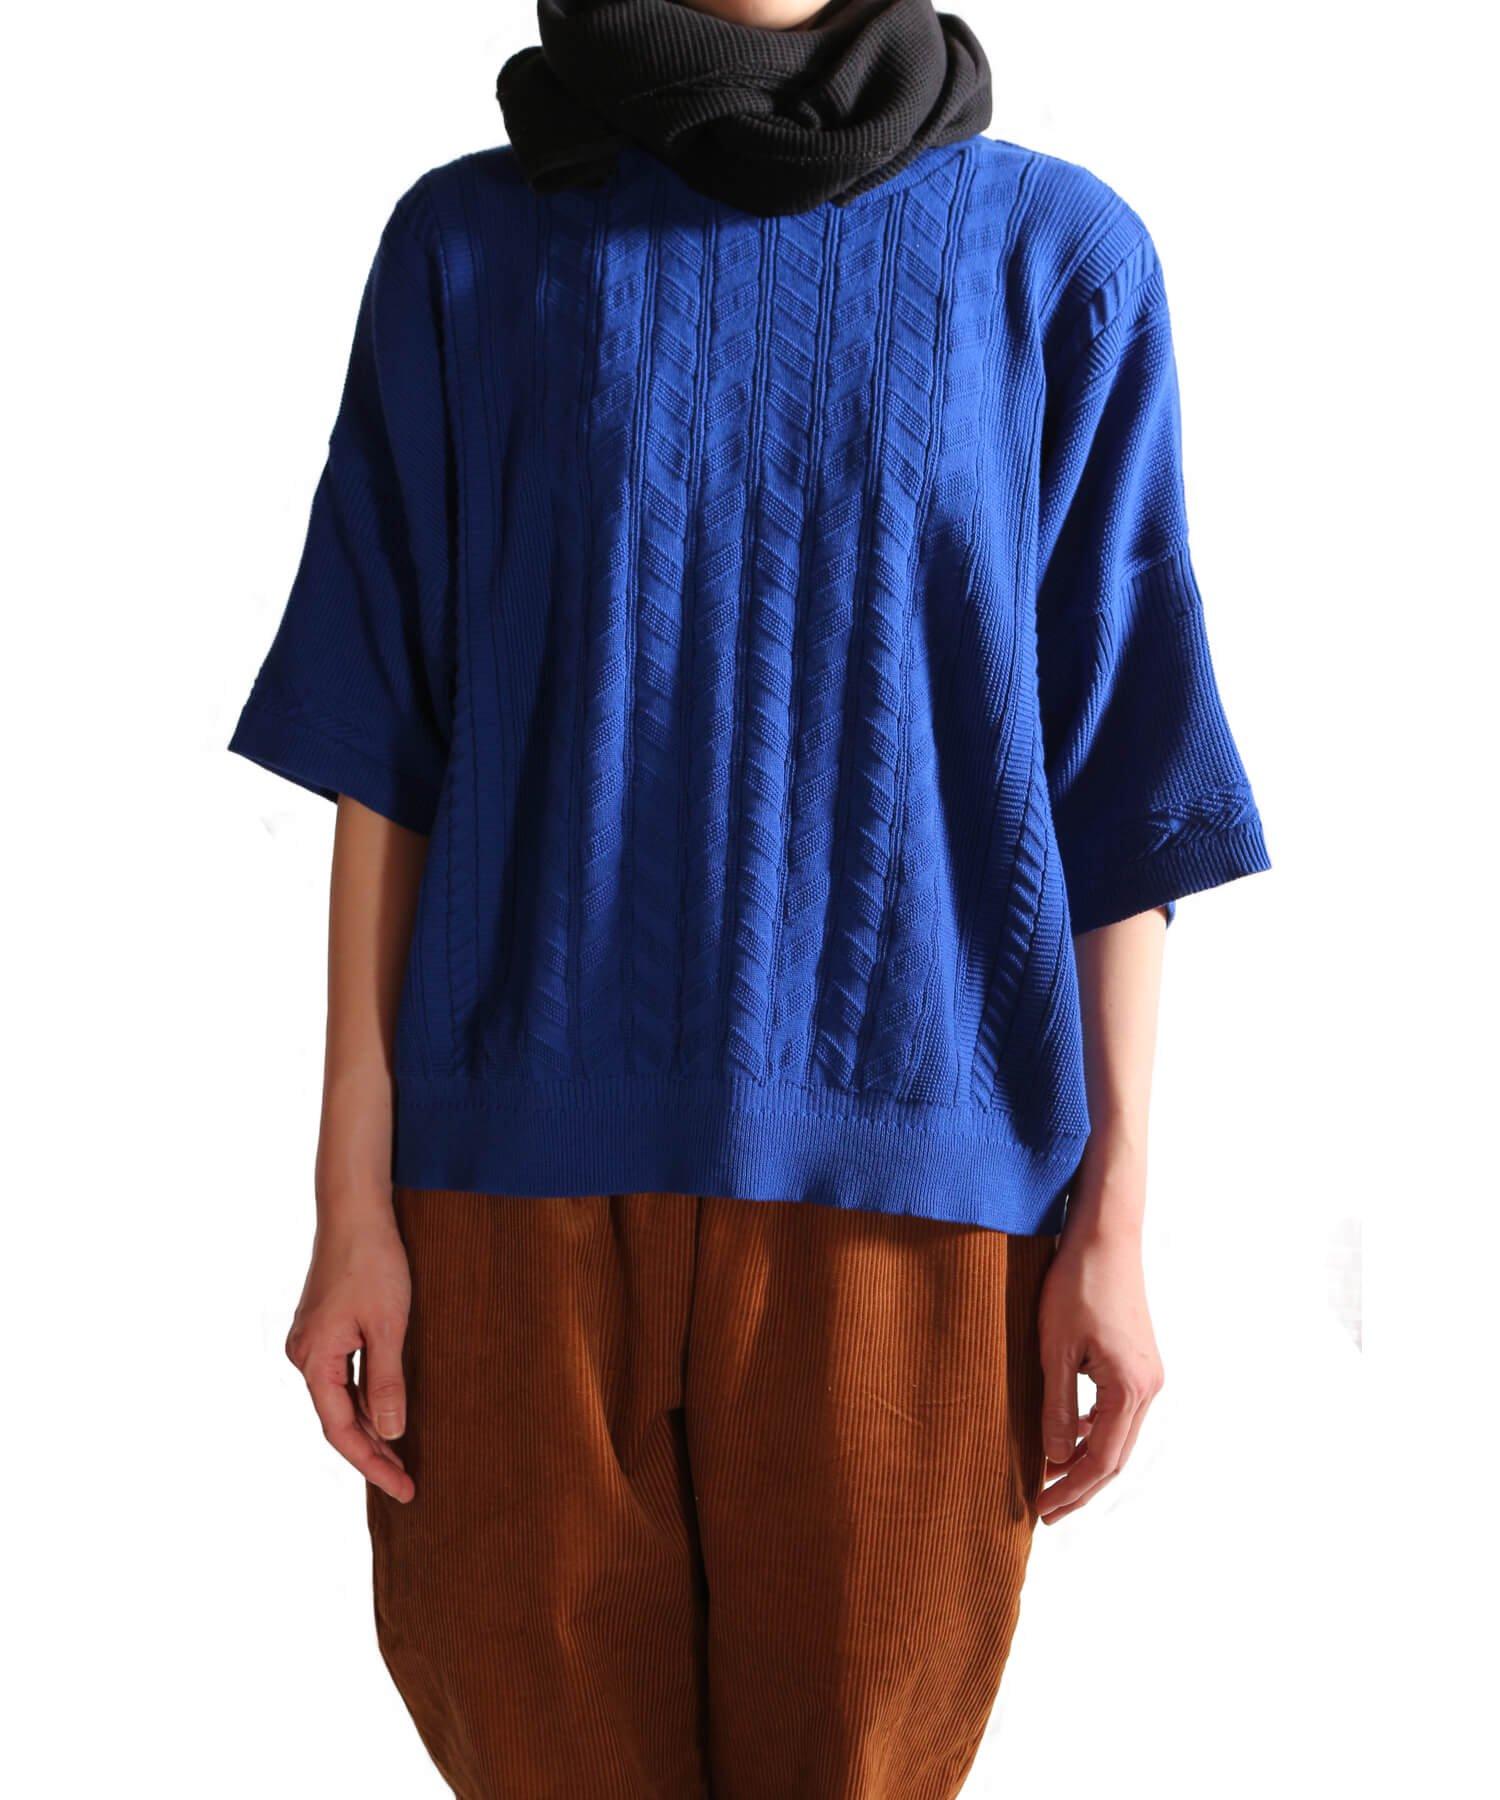 YASHIKI / ヤシキ |YASHIKI / ヤシキ × SIDEMILITIA inc. / サイドミリティア  RYUREI KNIT (LIMITED BLUE/WOMEN'S) 商品画像13